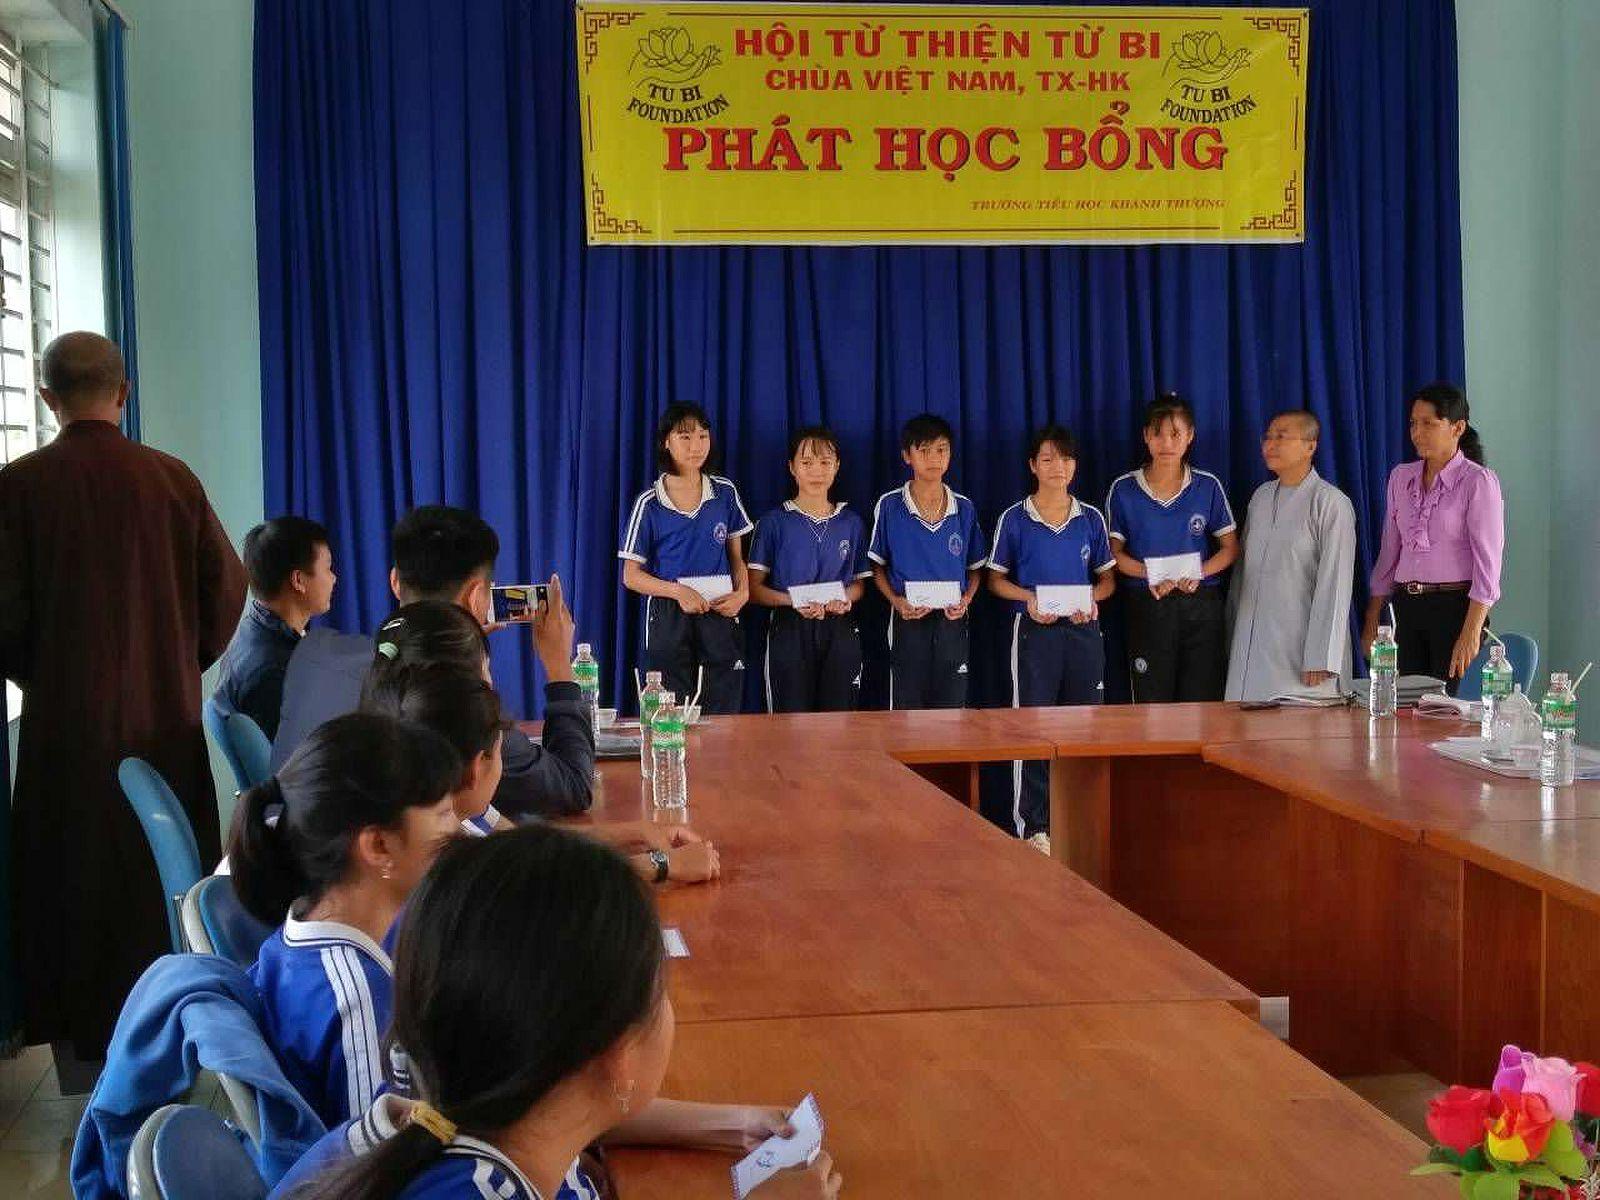 Phat Hoc Bong (05)